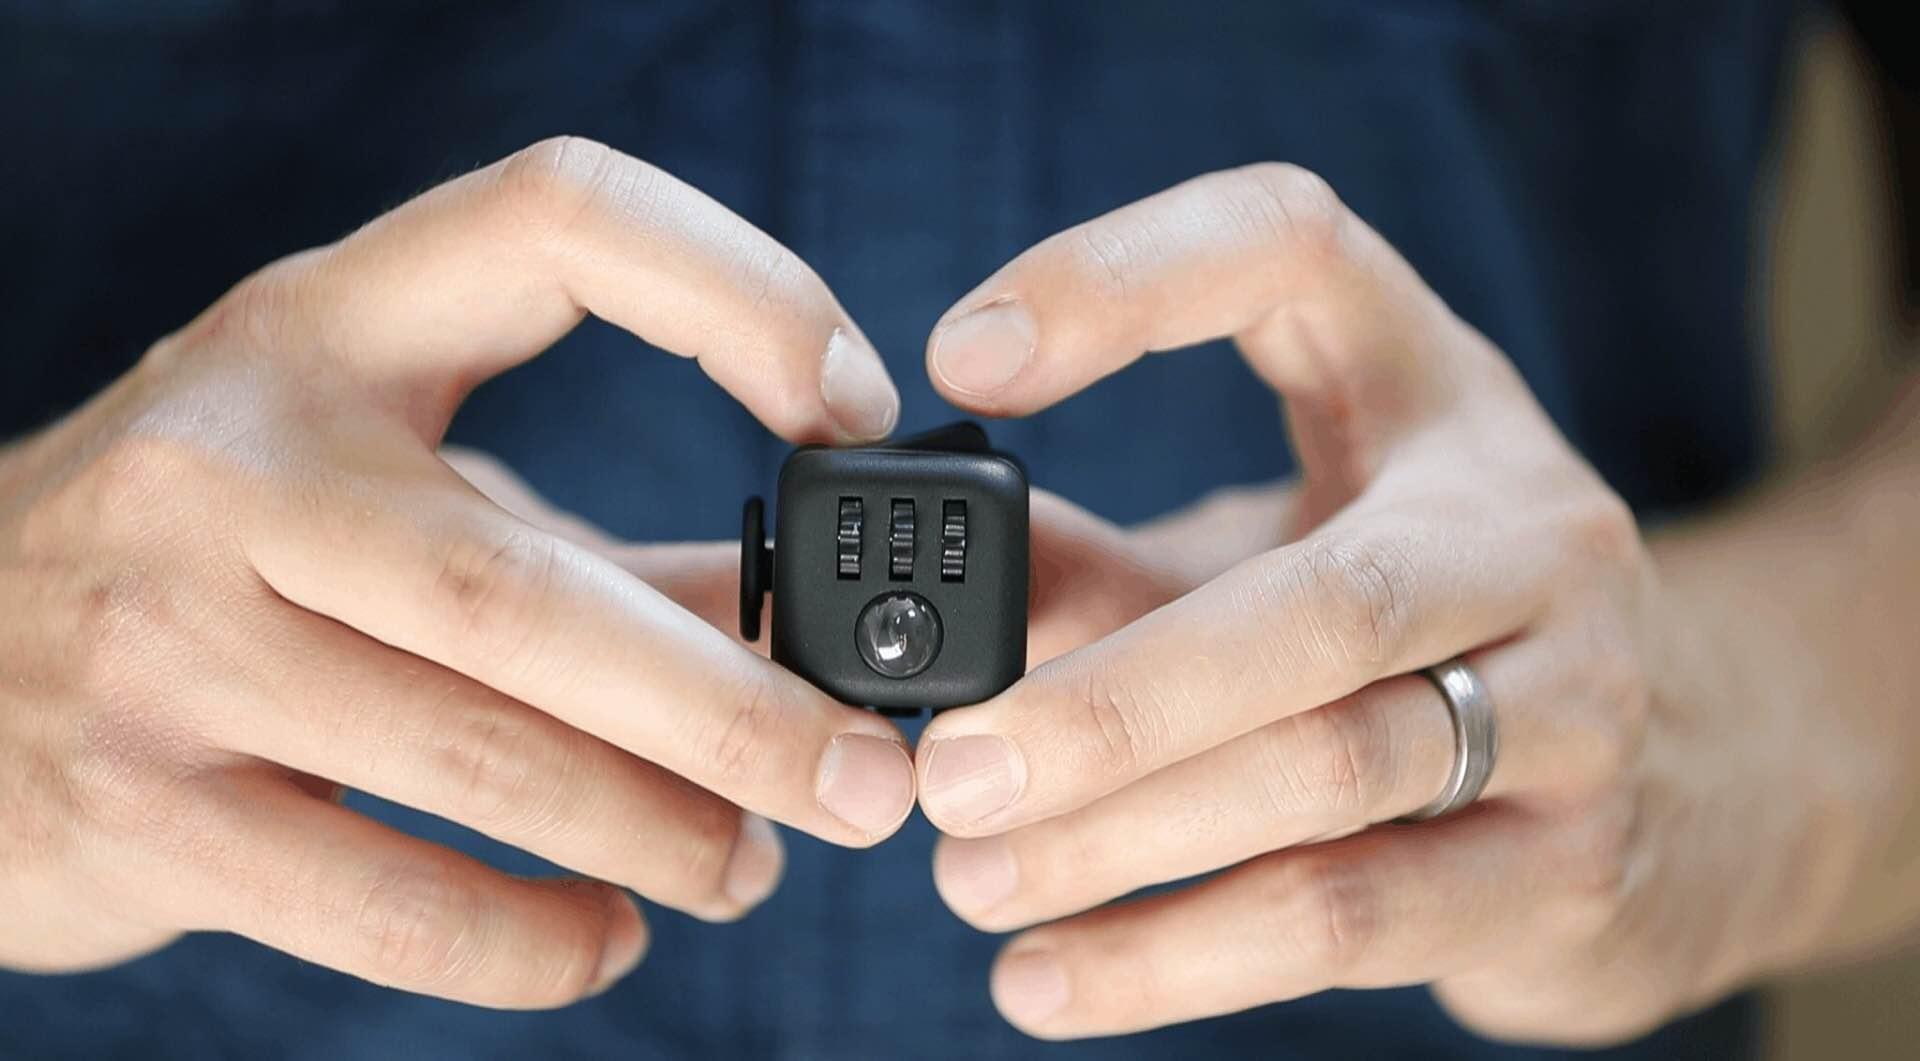 antsy-labs-fidget-cube